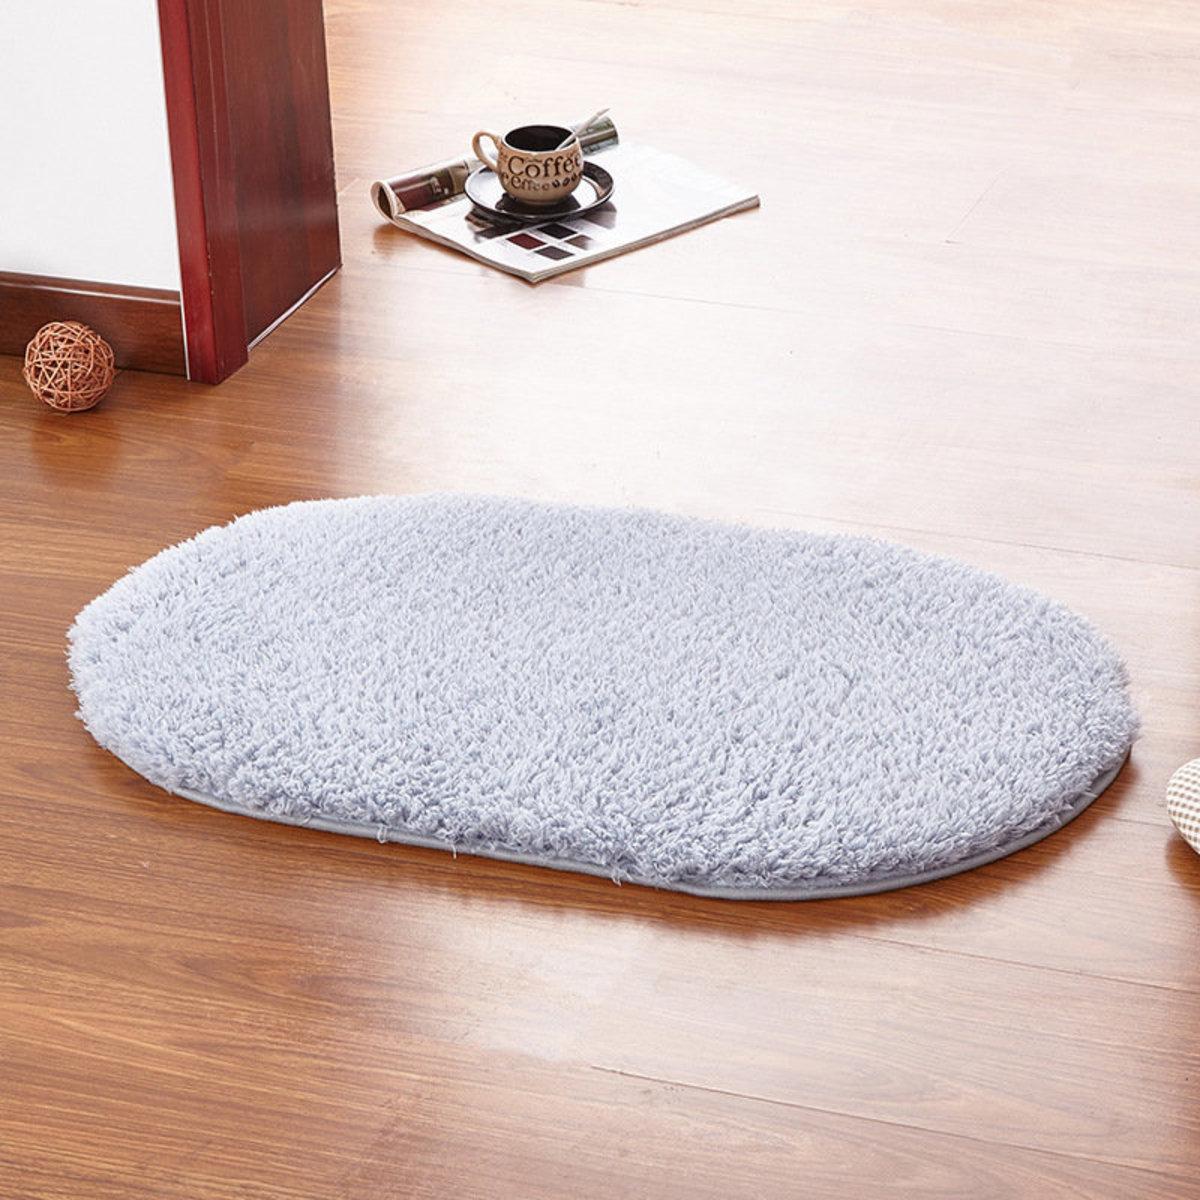 Bathroom mat / thickened long-hair absorbent non-slip rug / living room carpet (Blue/Grey)